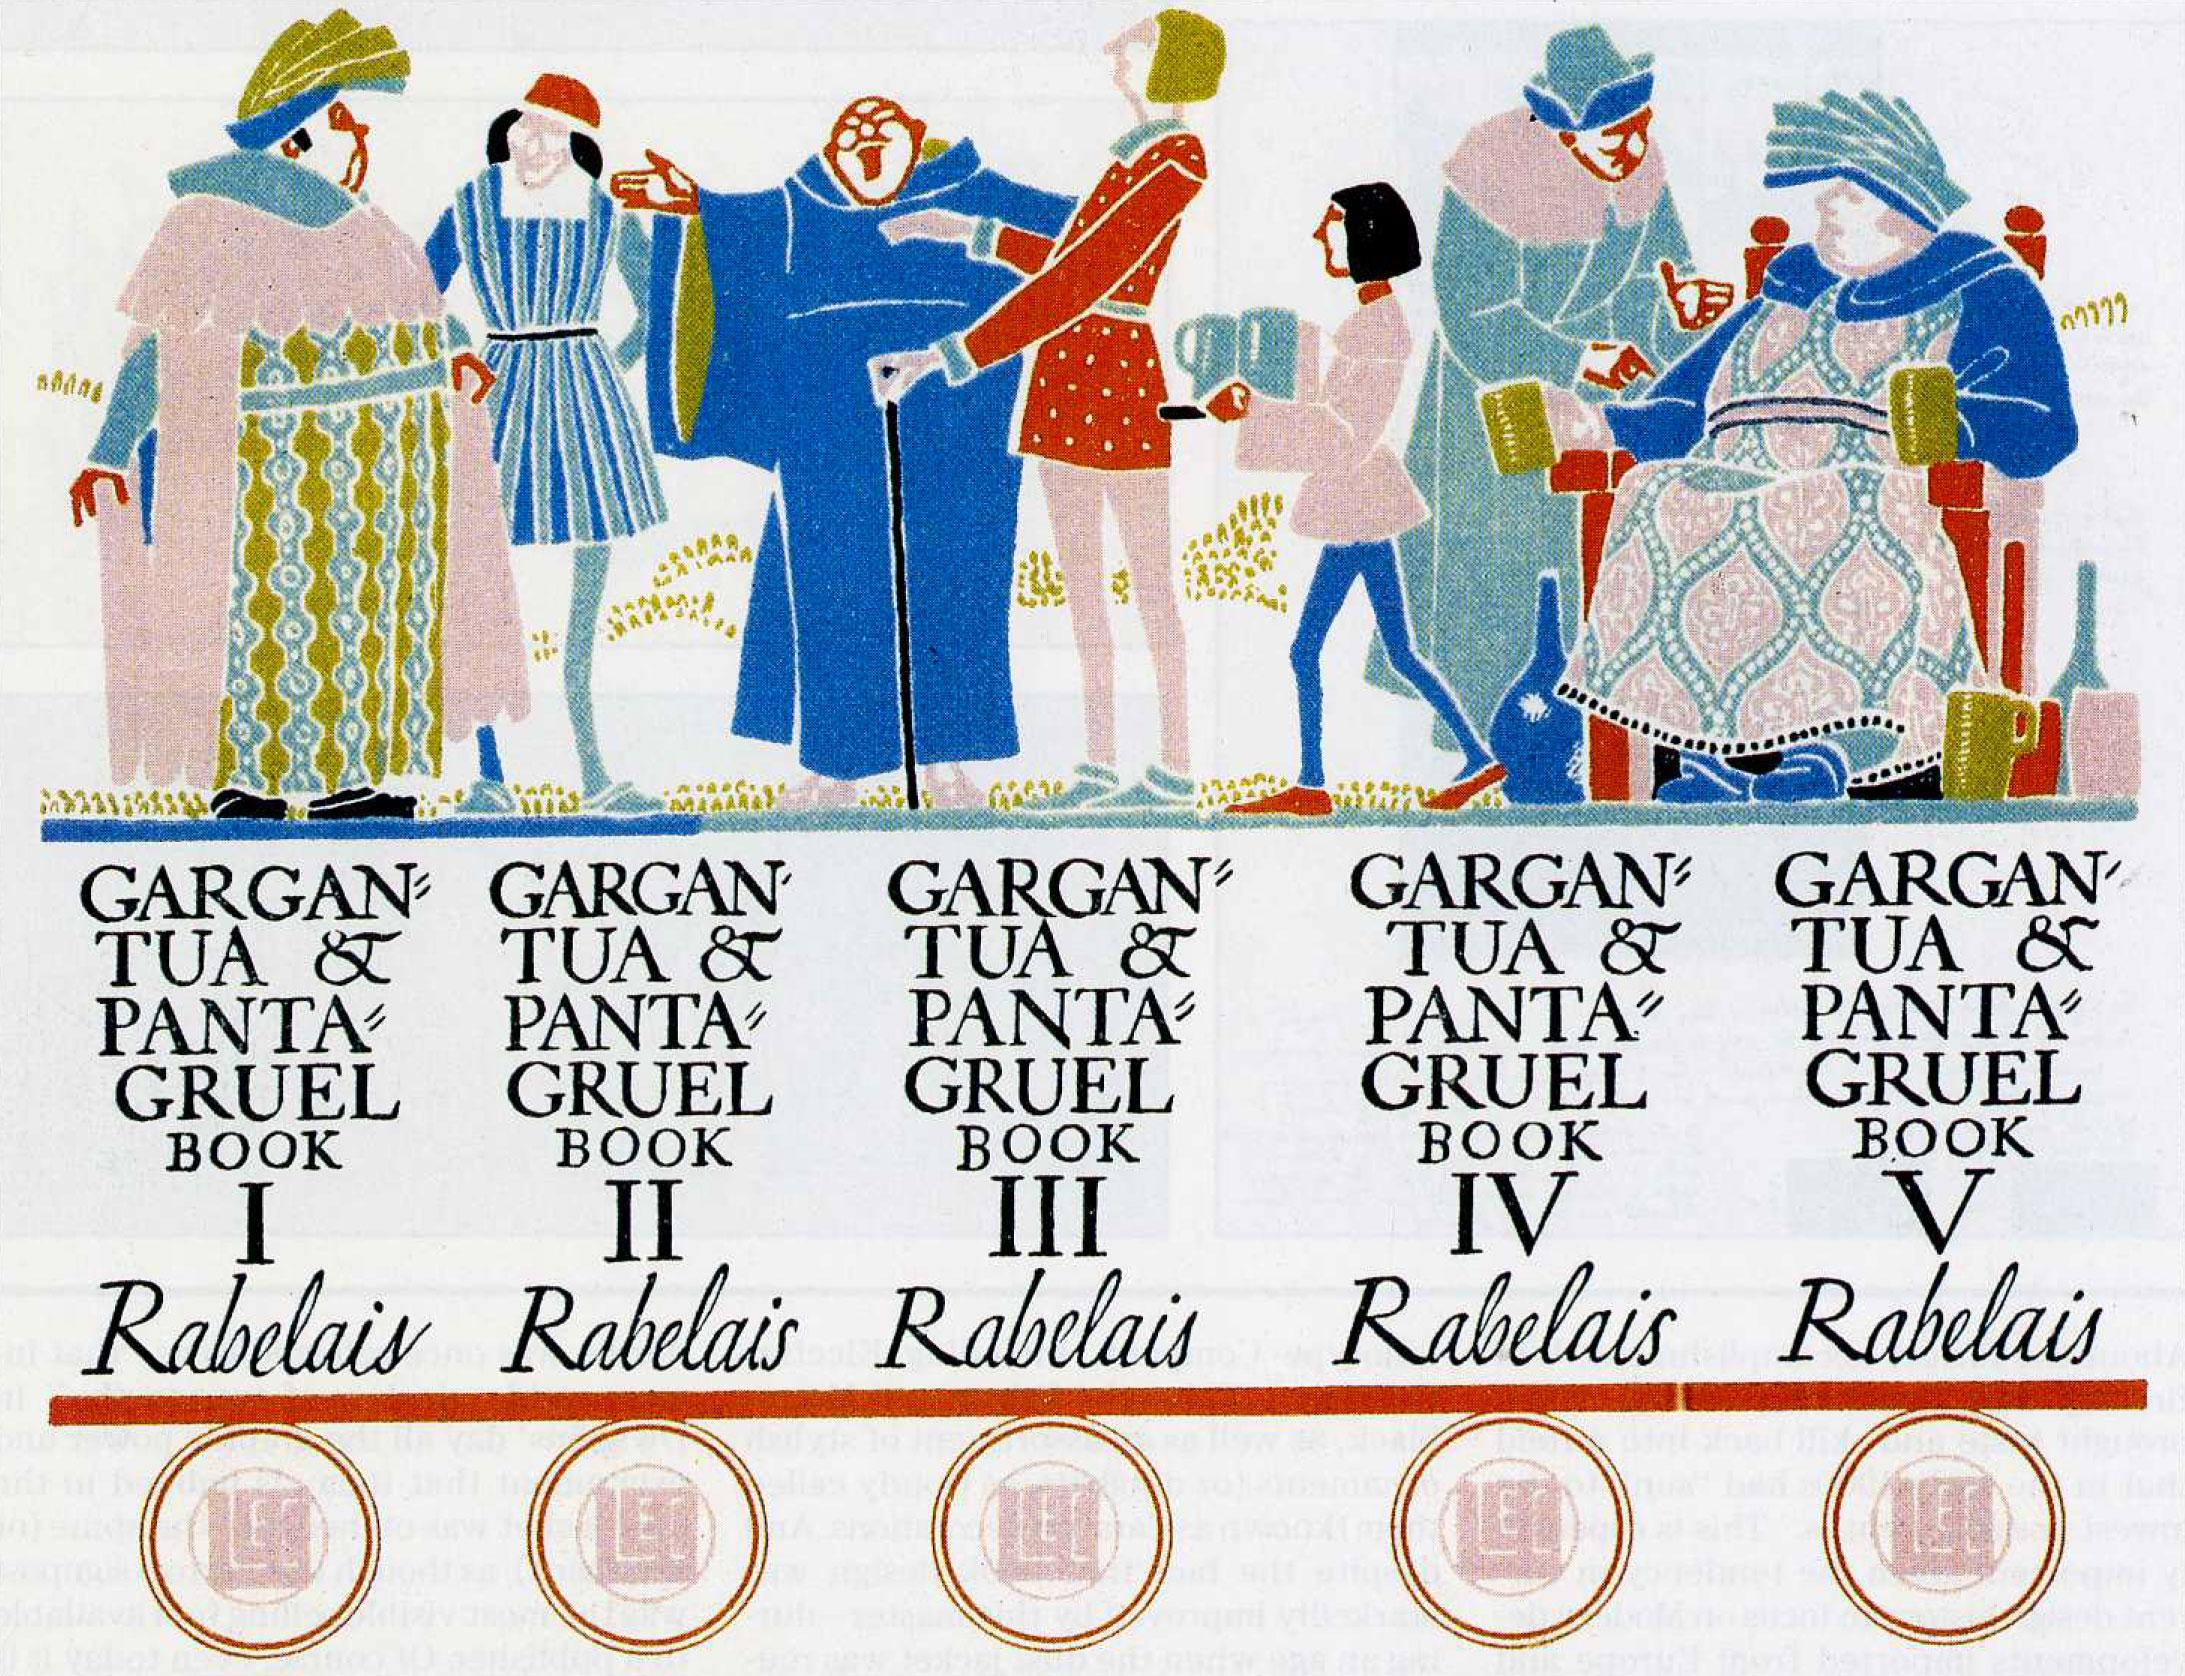 William-Addison-Dwiggins-livres-gargantua-1936-sketch